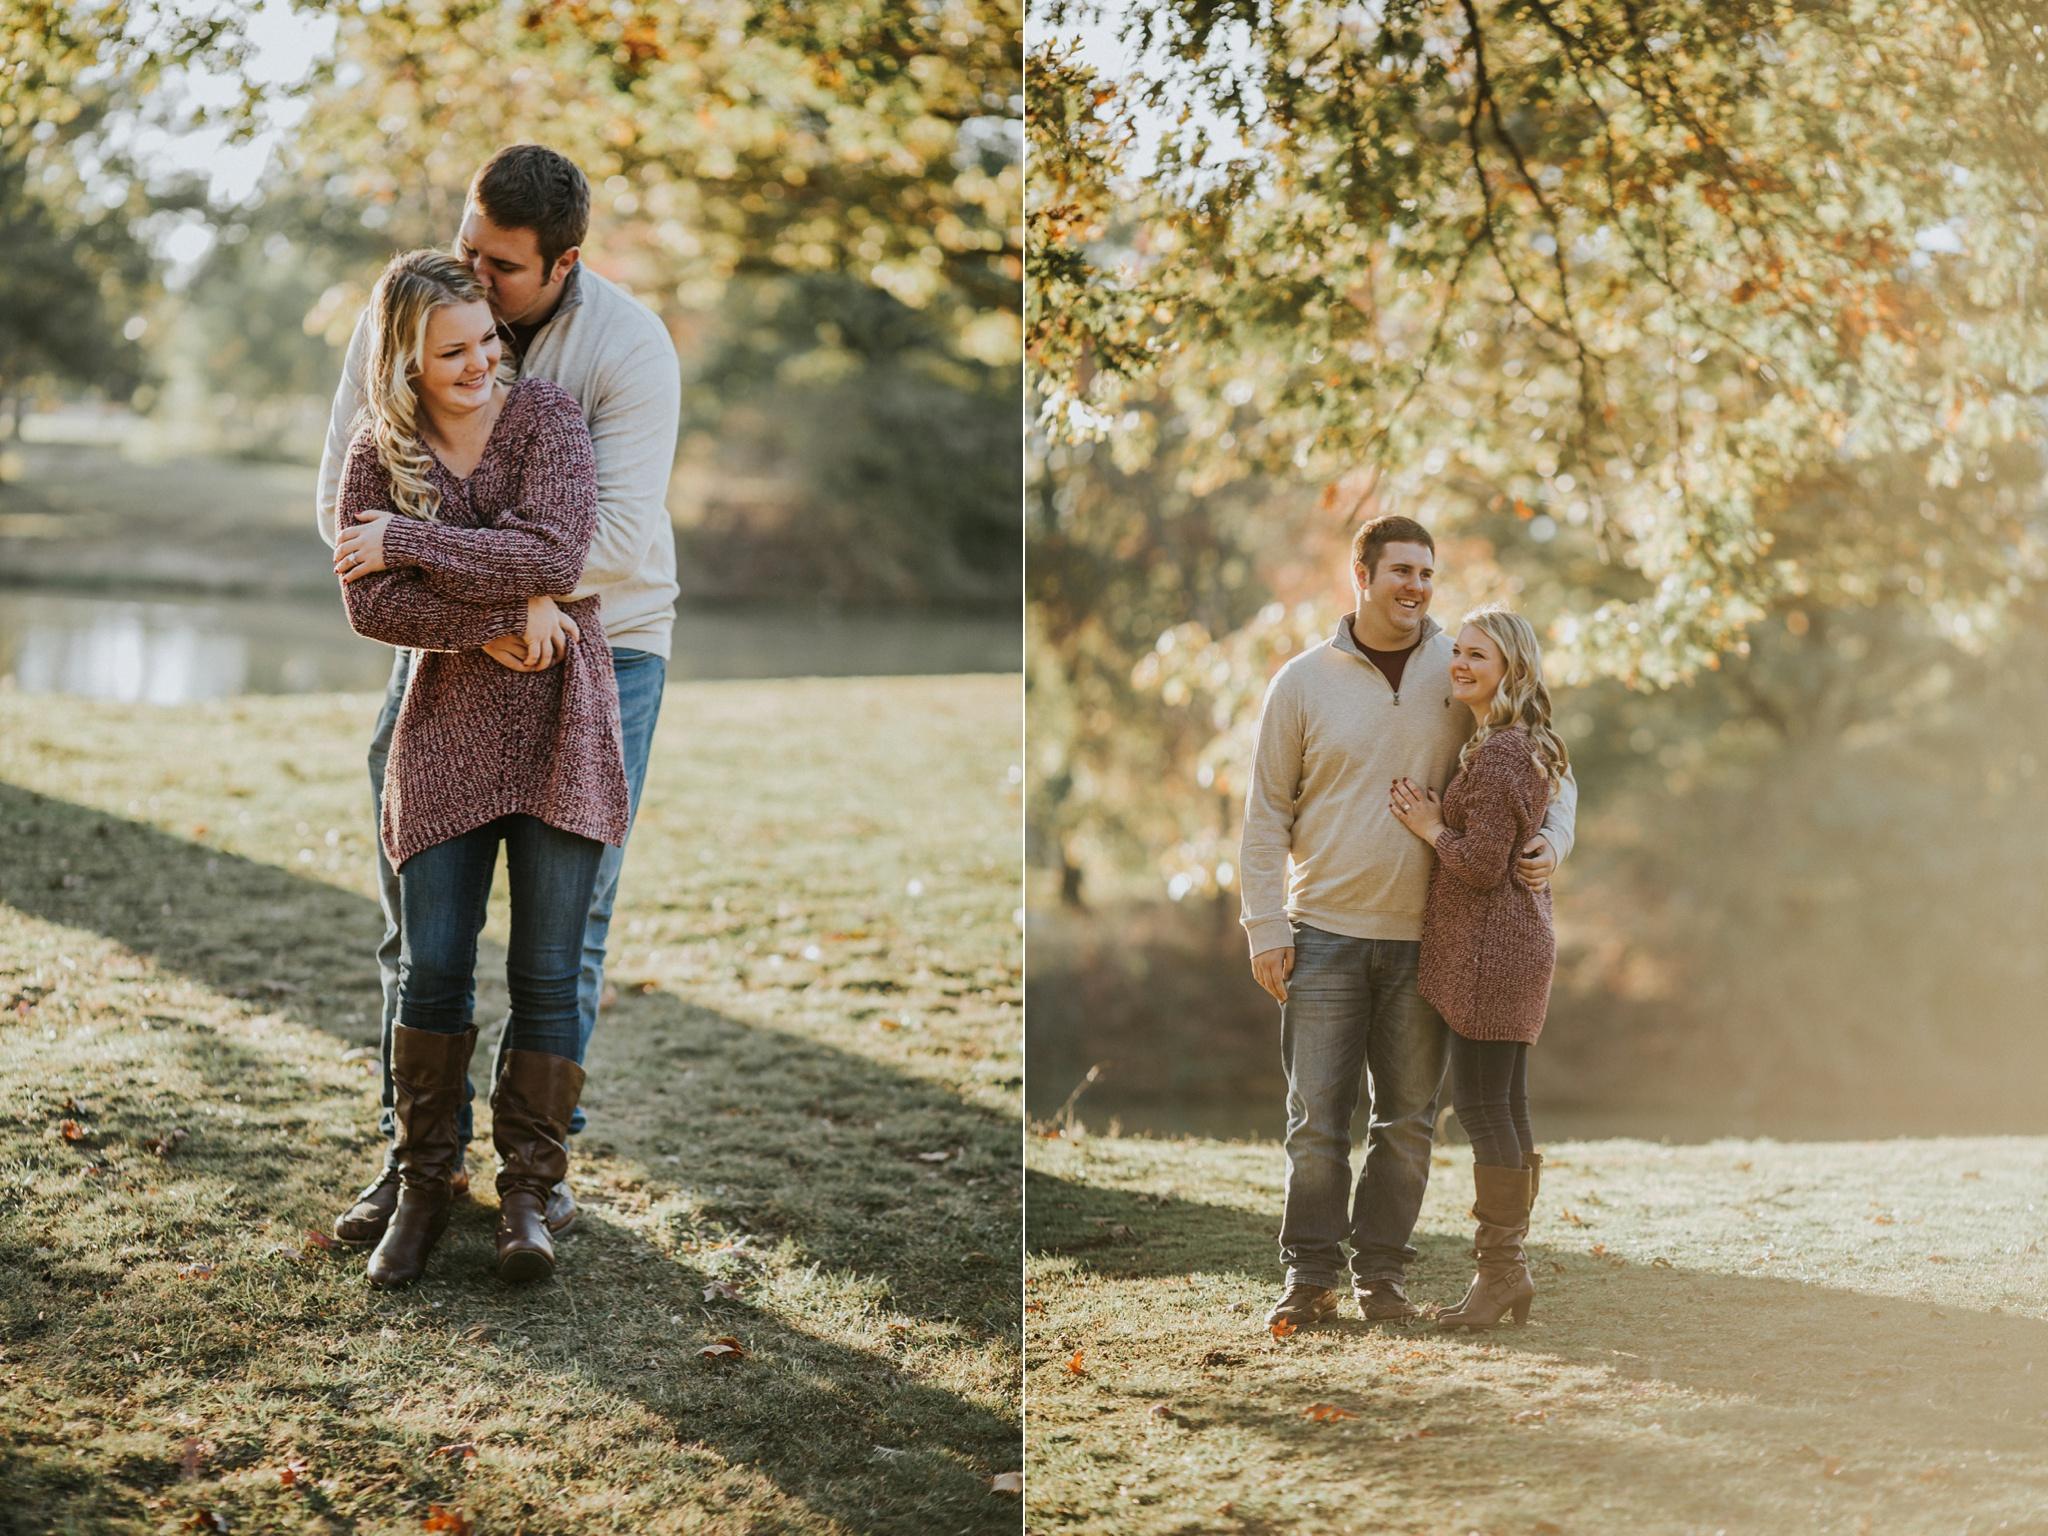 Bosse-Field-Engagement-Photos-Evansville_0020.jpg